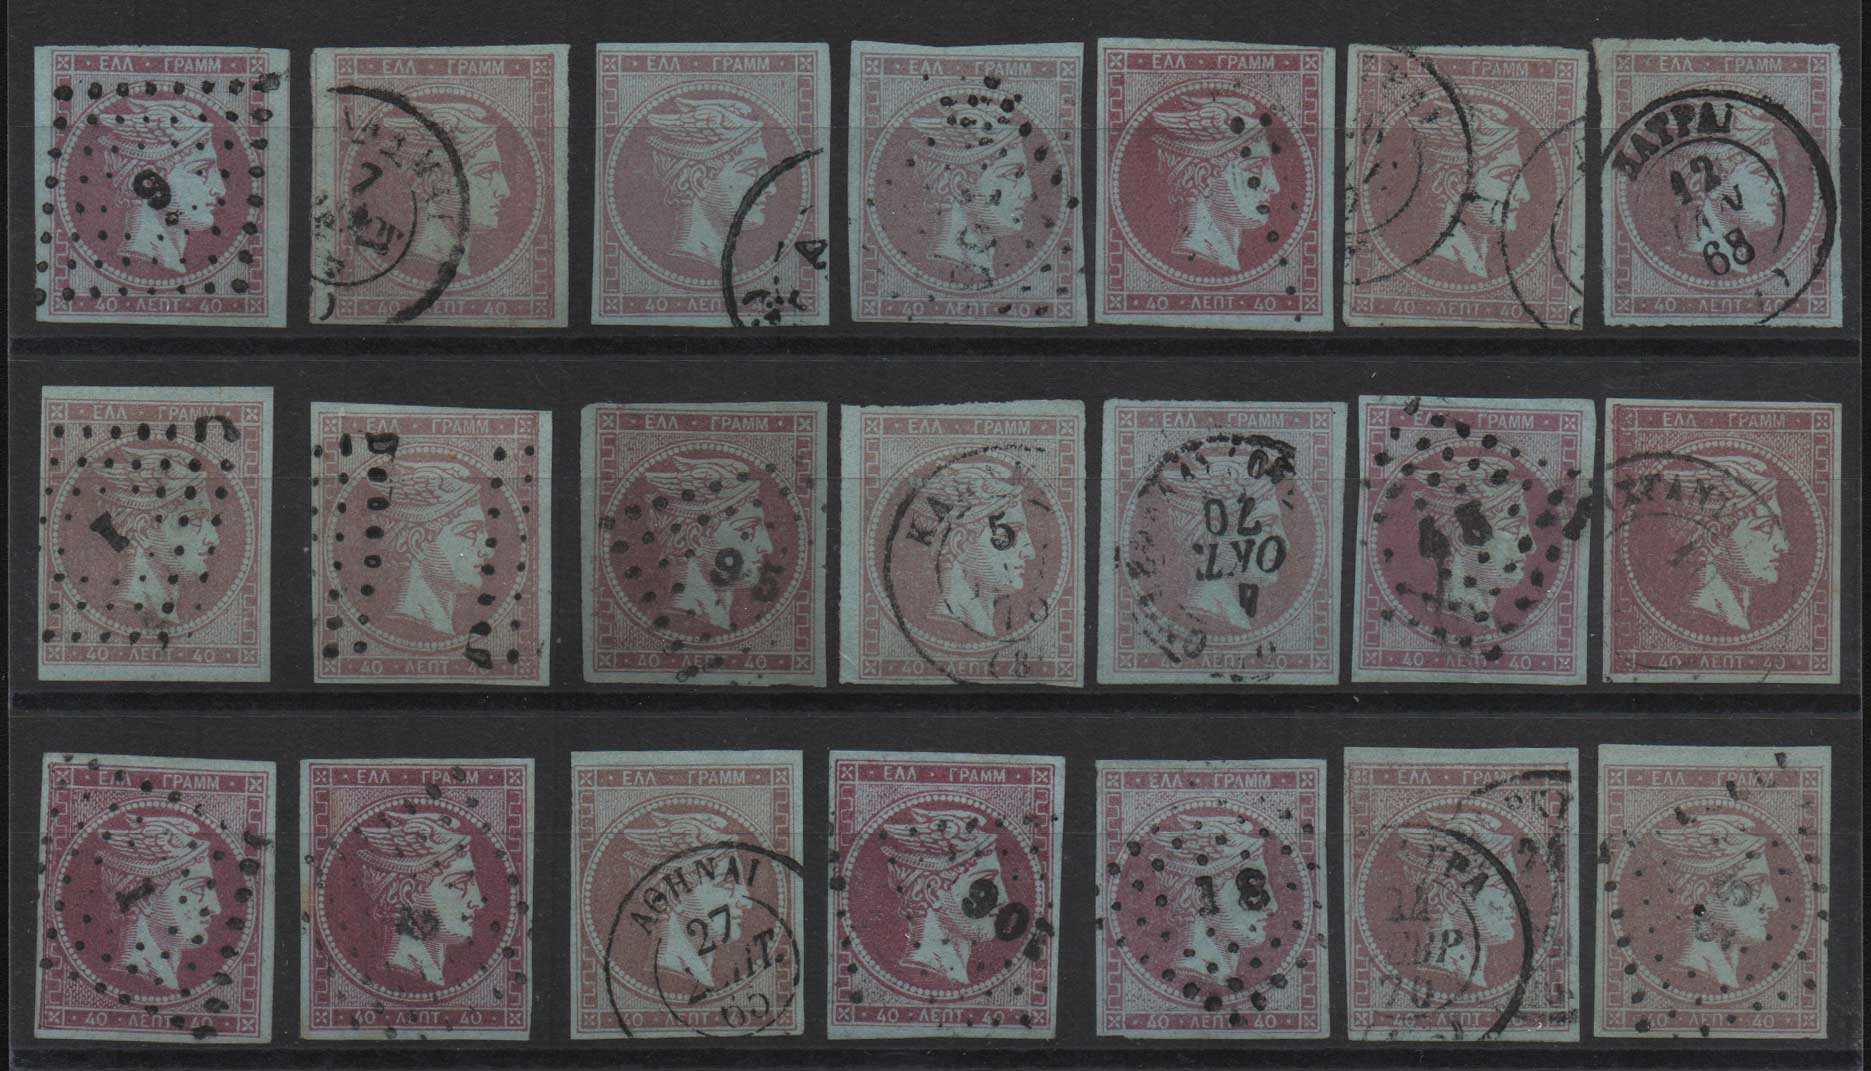 Lot 8 - -  LARGE HERMES HEAD large hermes head -  Athens Auctions Public Auction 71 General Stamp Sale